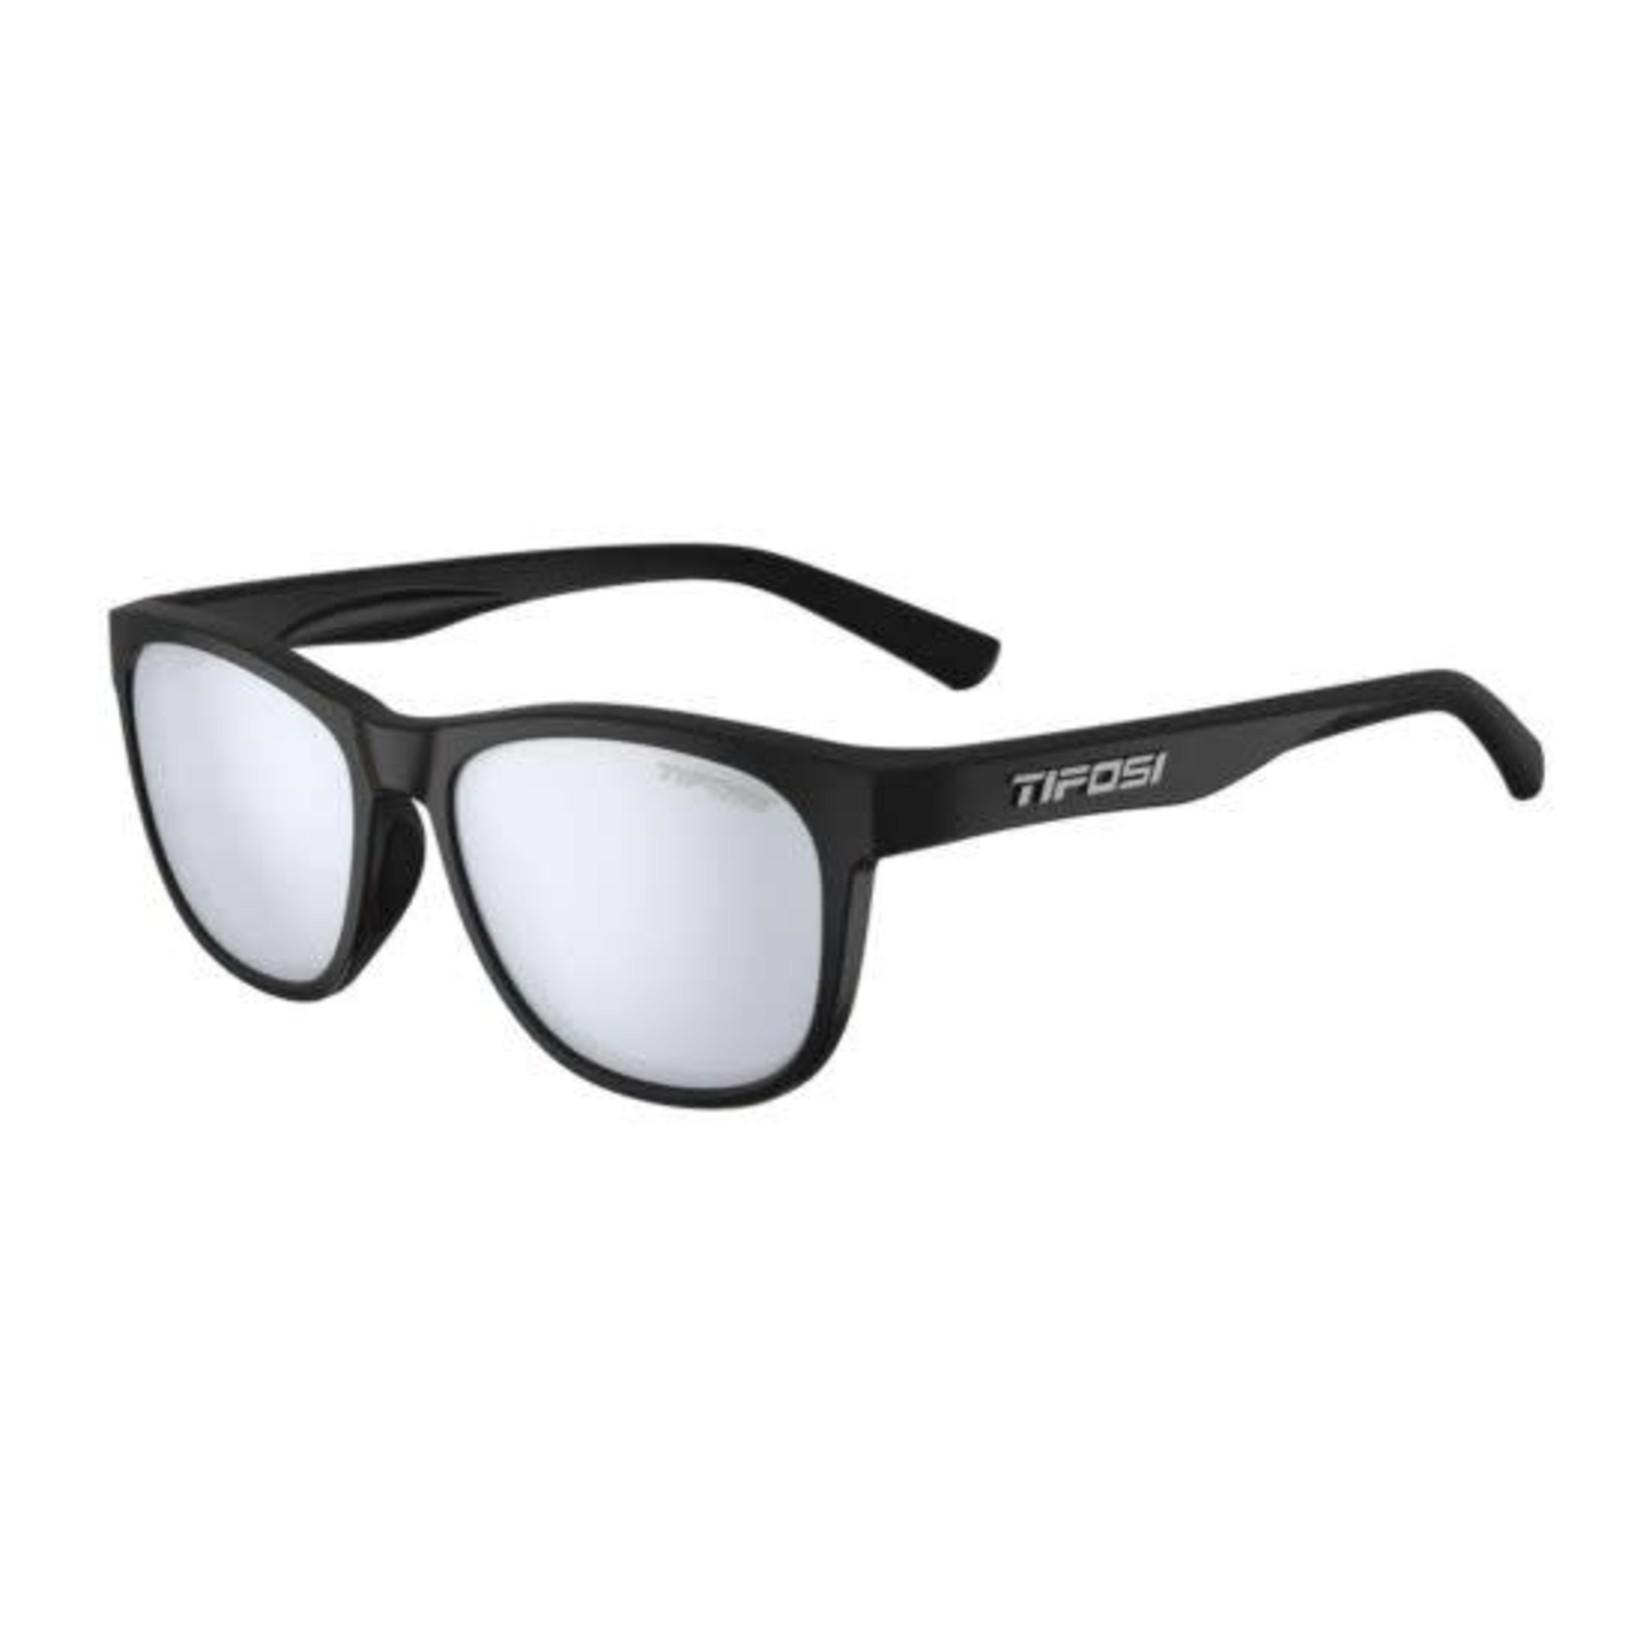 Tifosi Optics Swank, Satin Black Single Lens Sunglasses